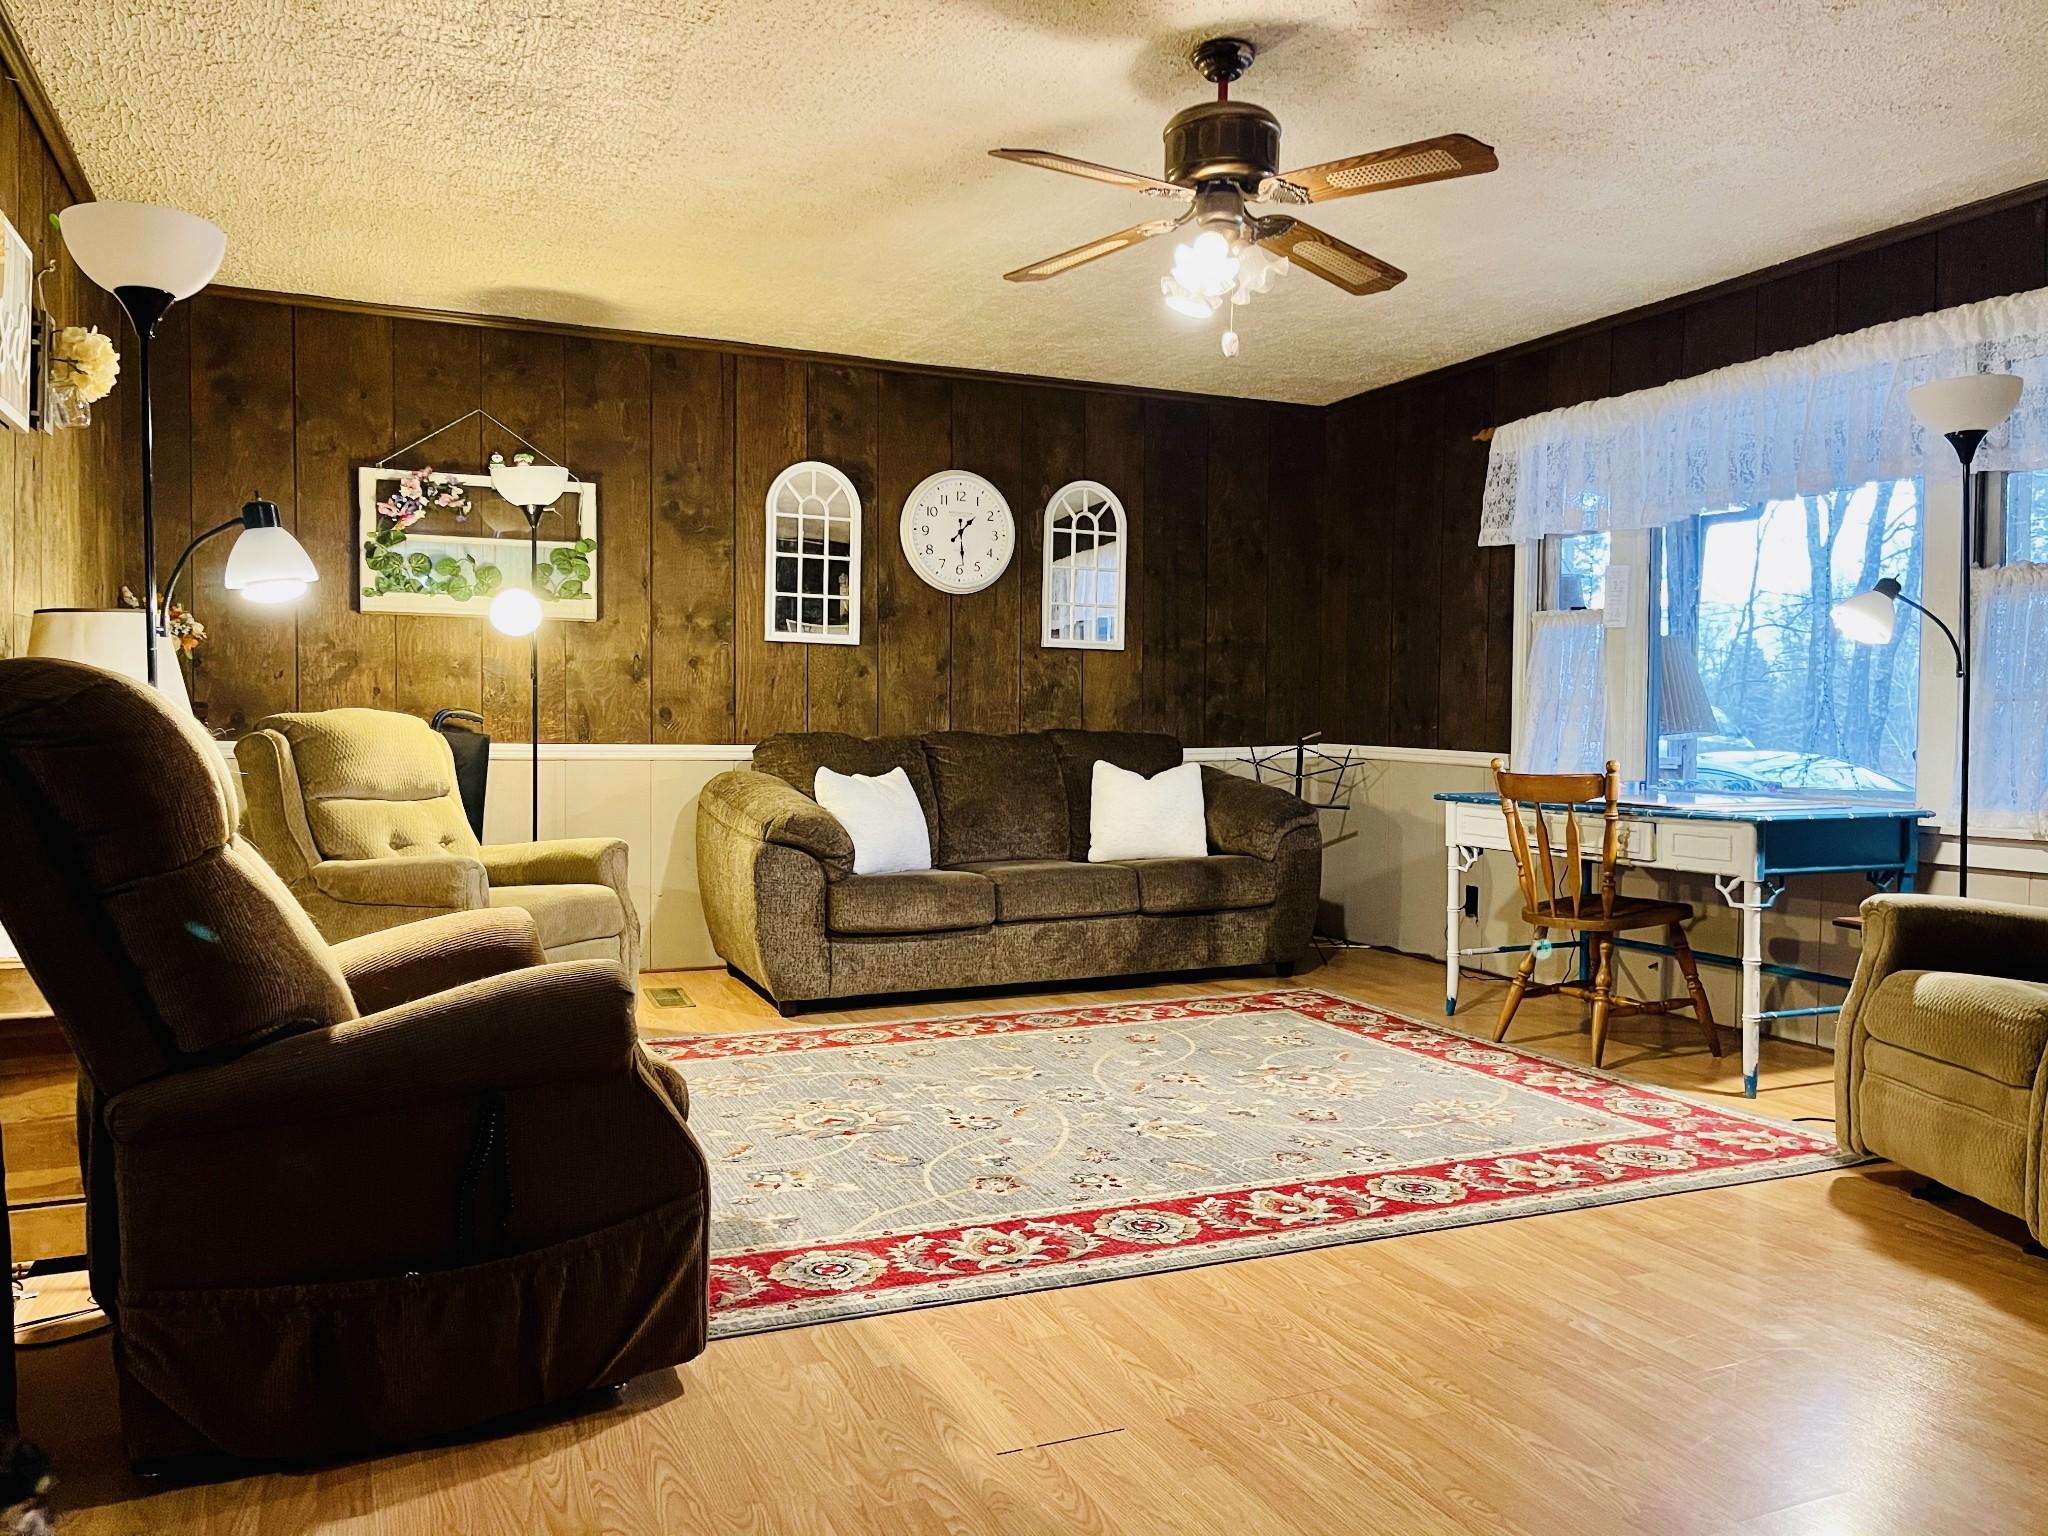 1490 Slaydenwood Rd Property Photo - Cumberland Furnace, TN real estate listing